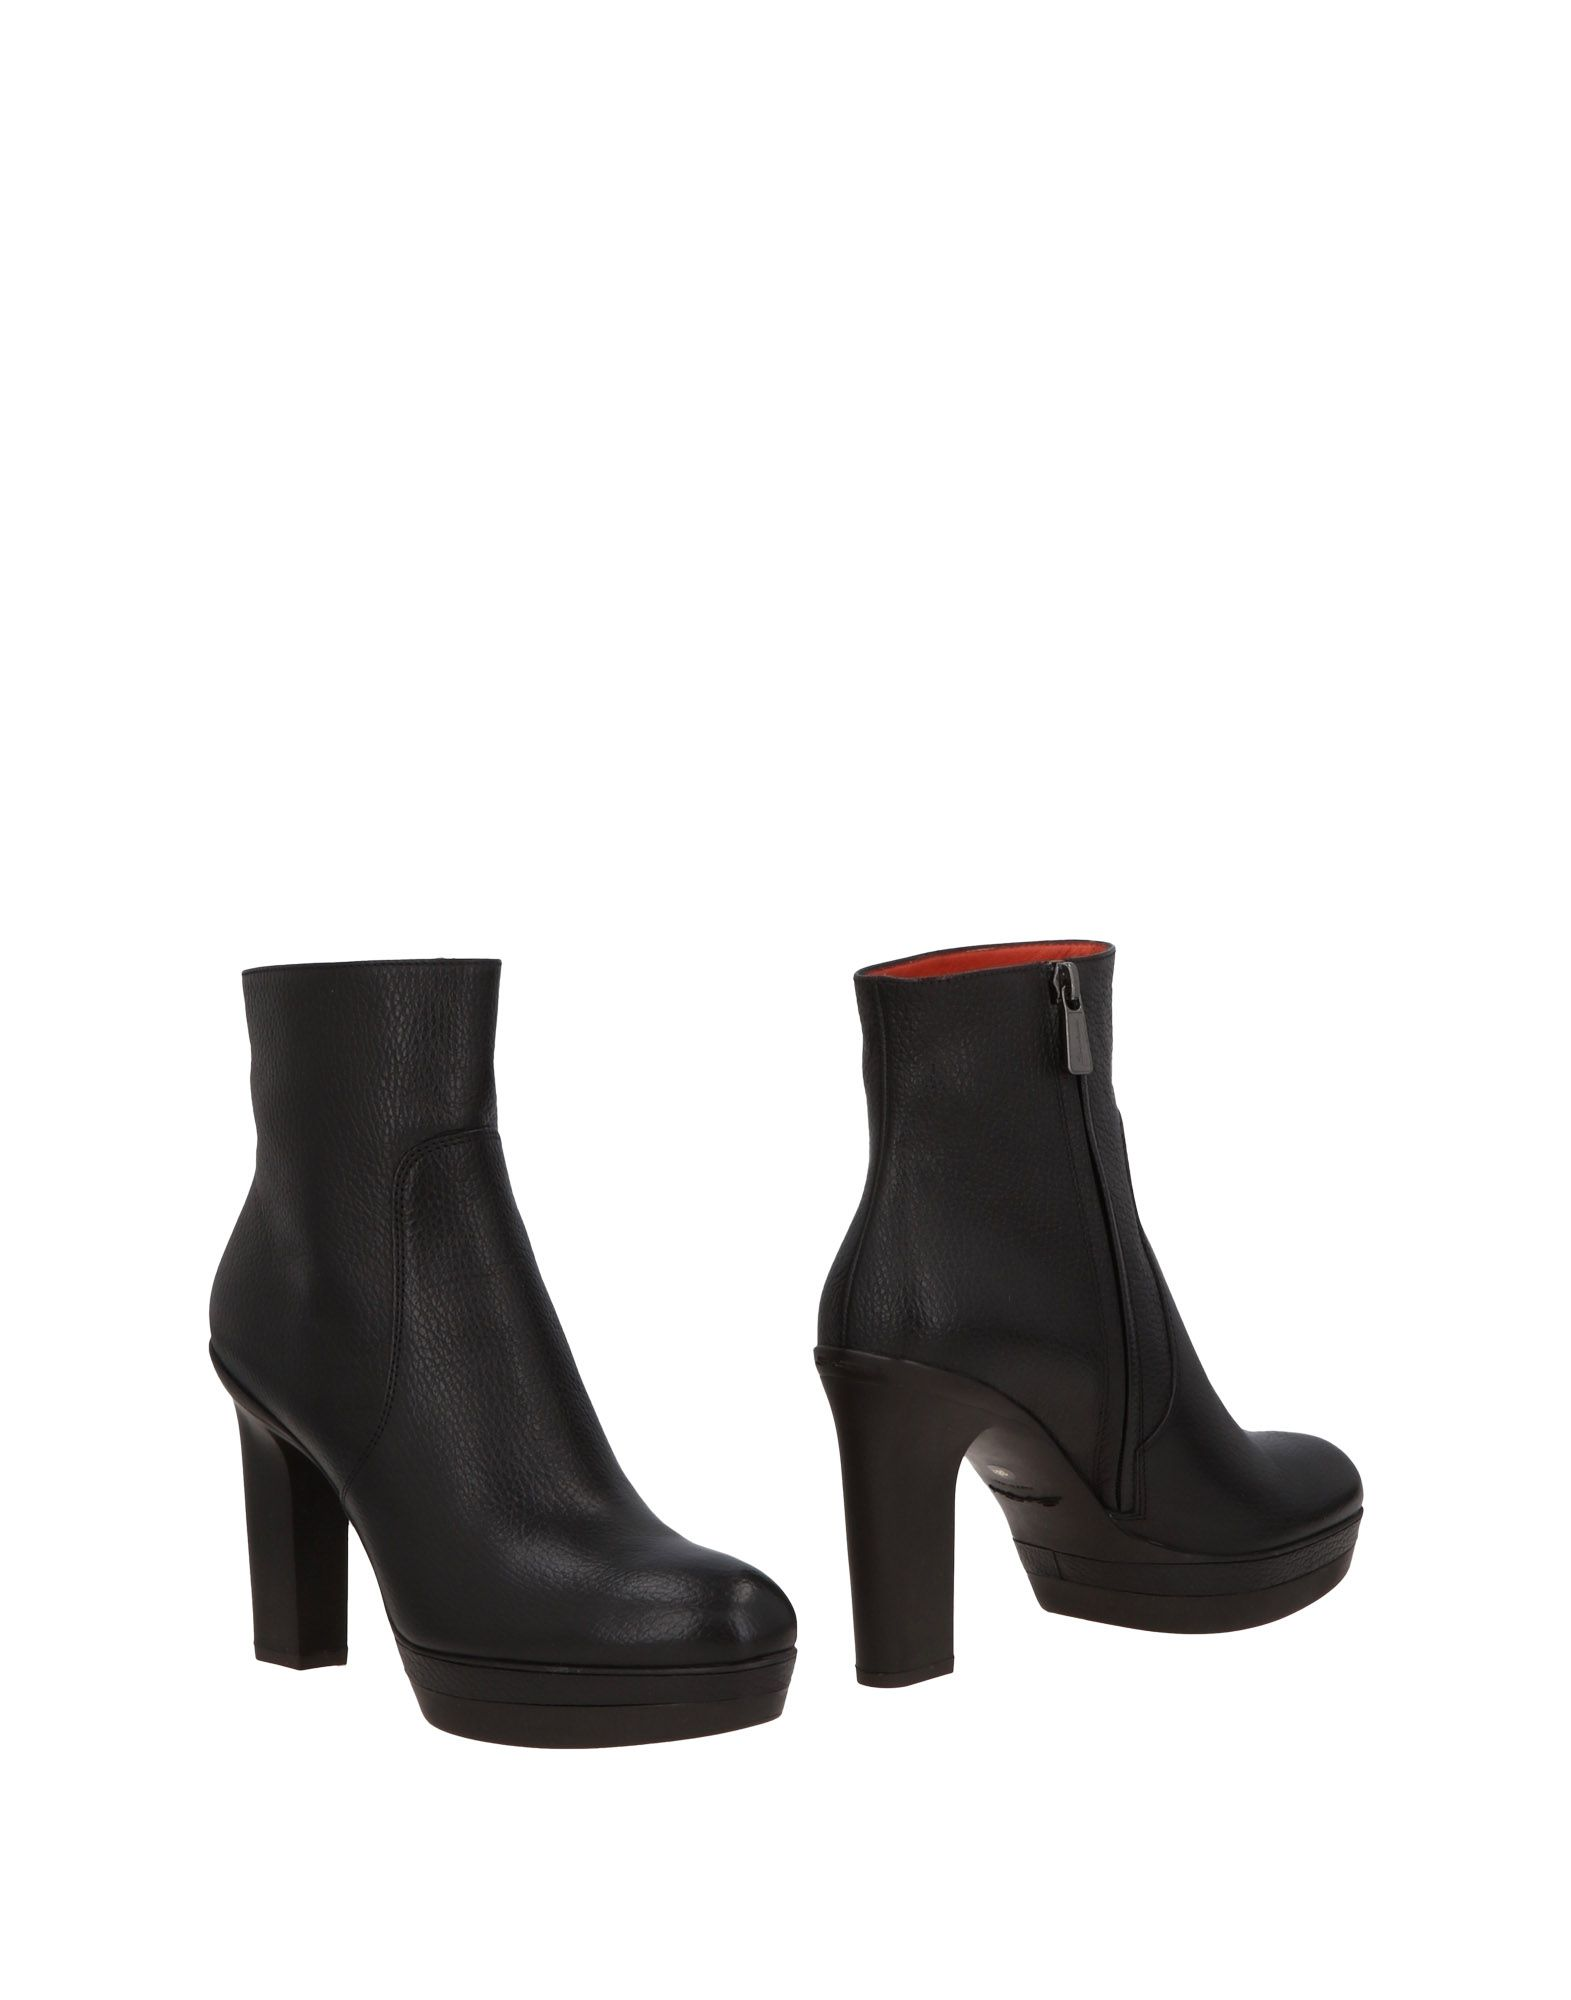 Santoni Stiefelette aussehende Damen  11479326NUGünstige gut aussehende Stiefelette Schuhe d01f08